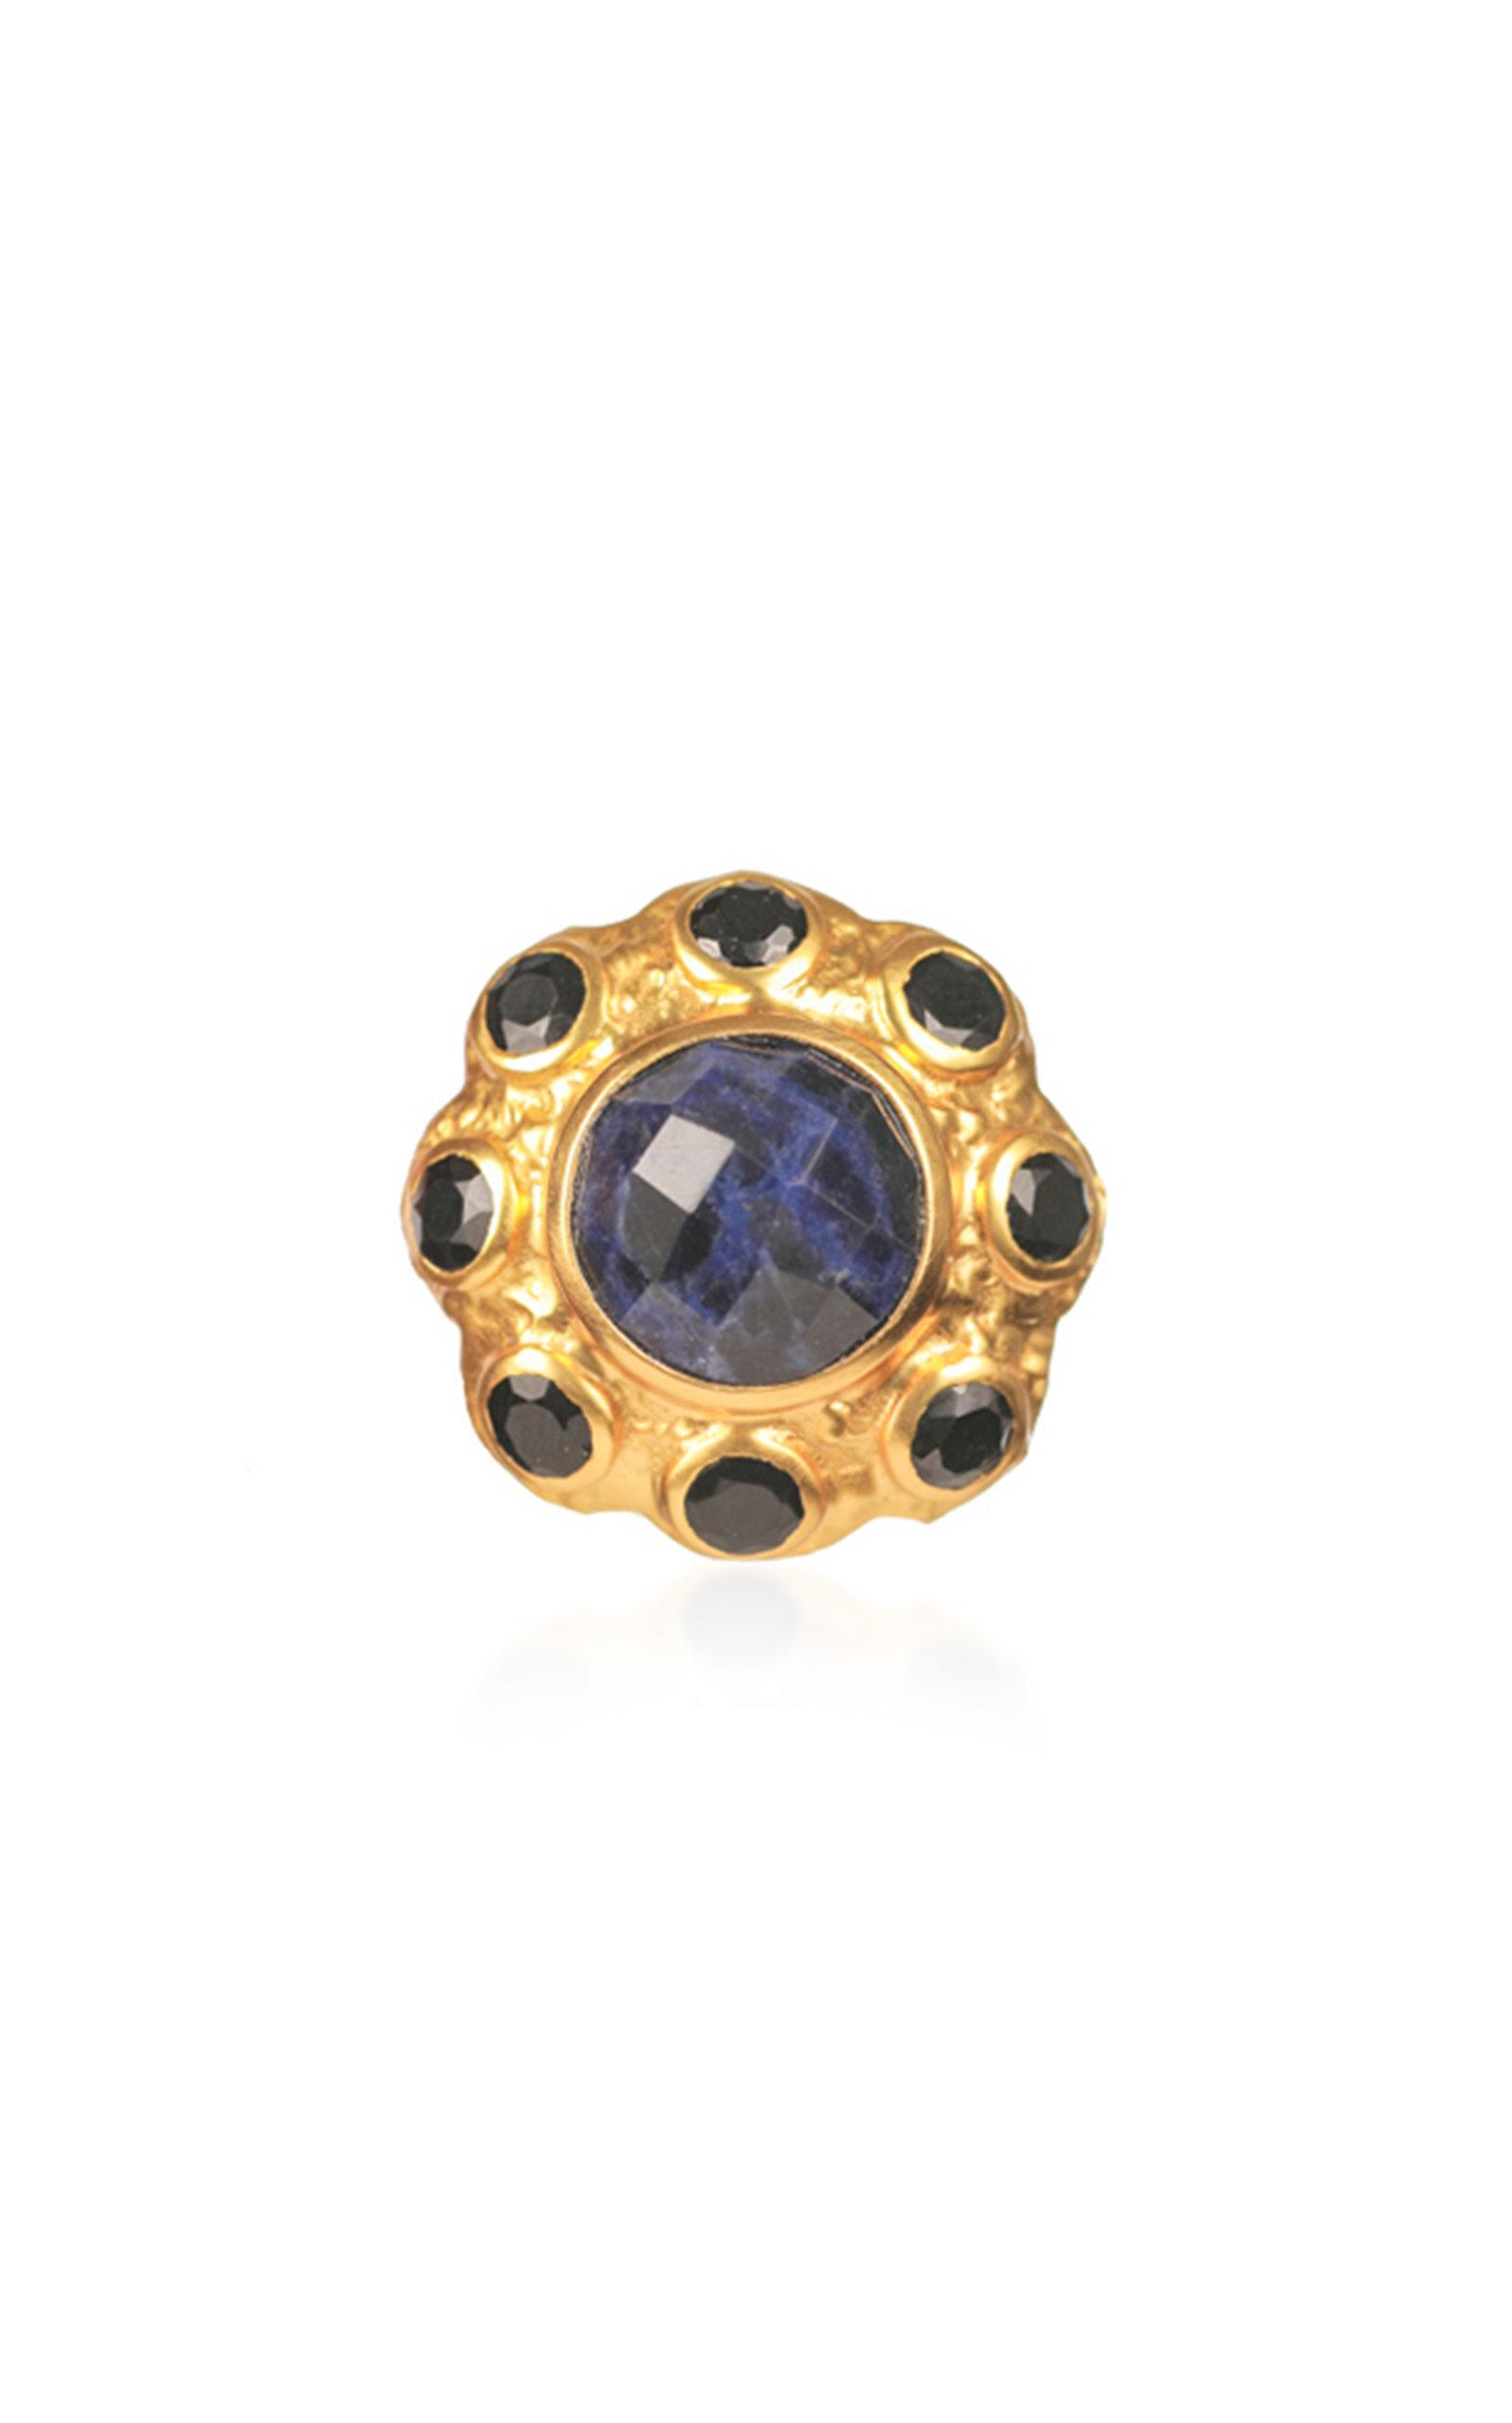 large_valere-black-lola-ring.jpg